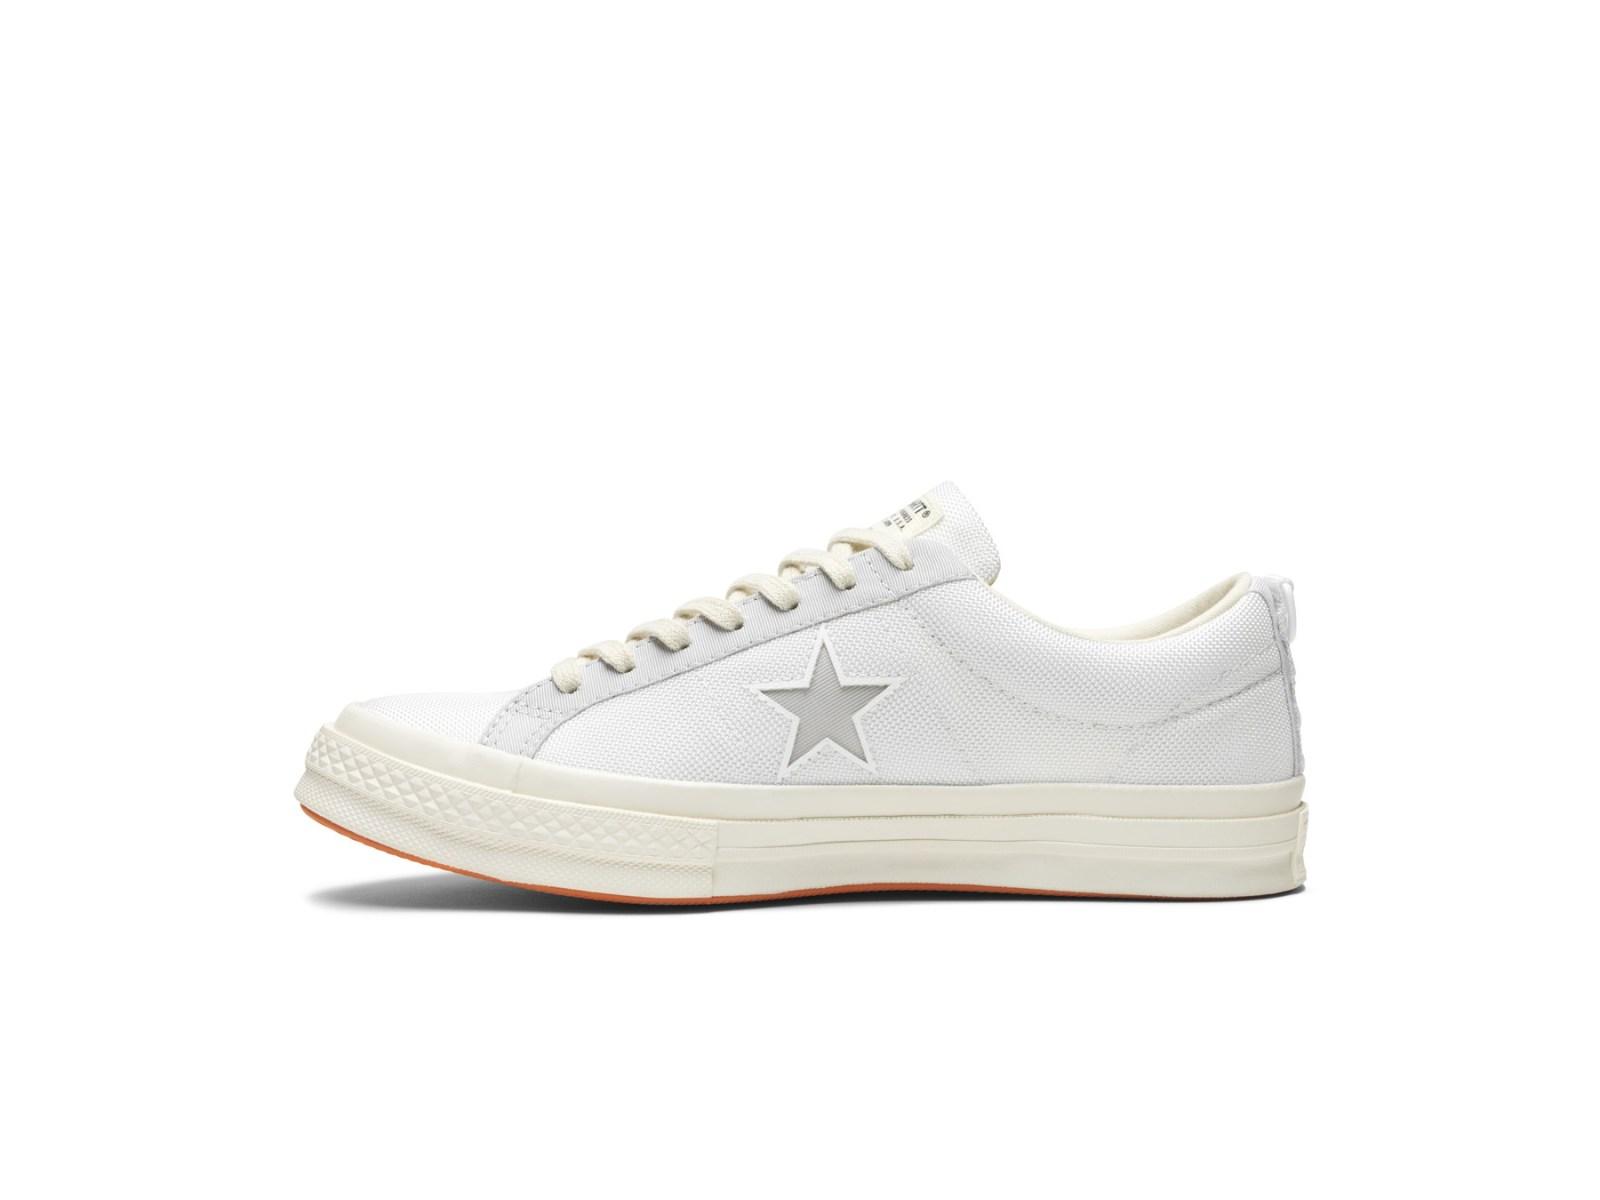 Converse x Carhartt WIP 聯乘 One Star 系列正式發佈